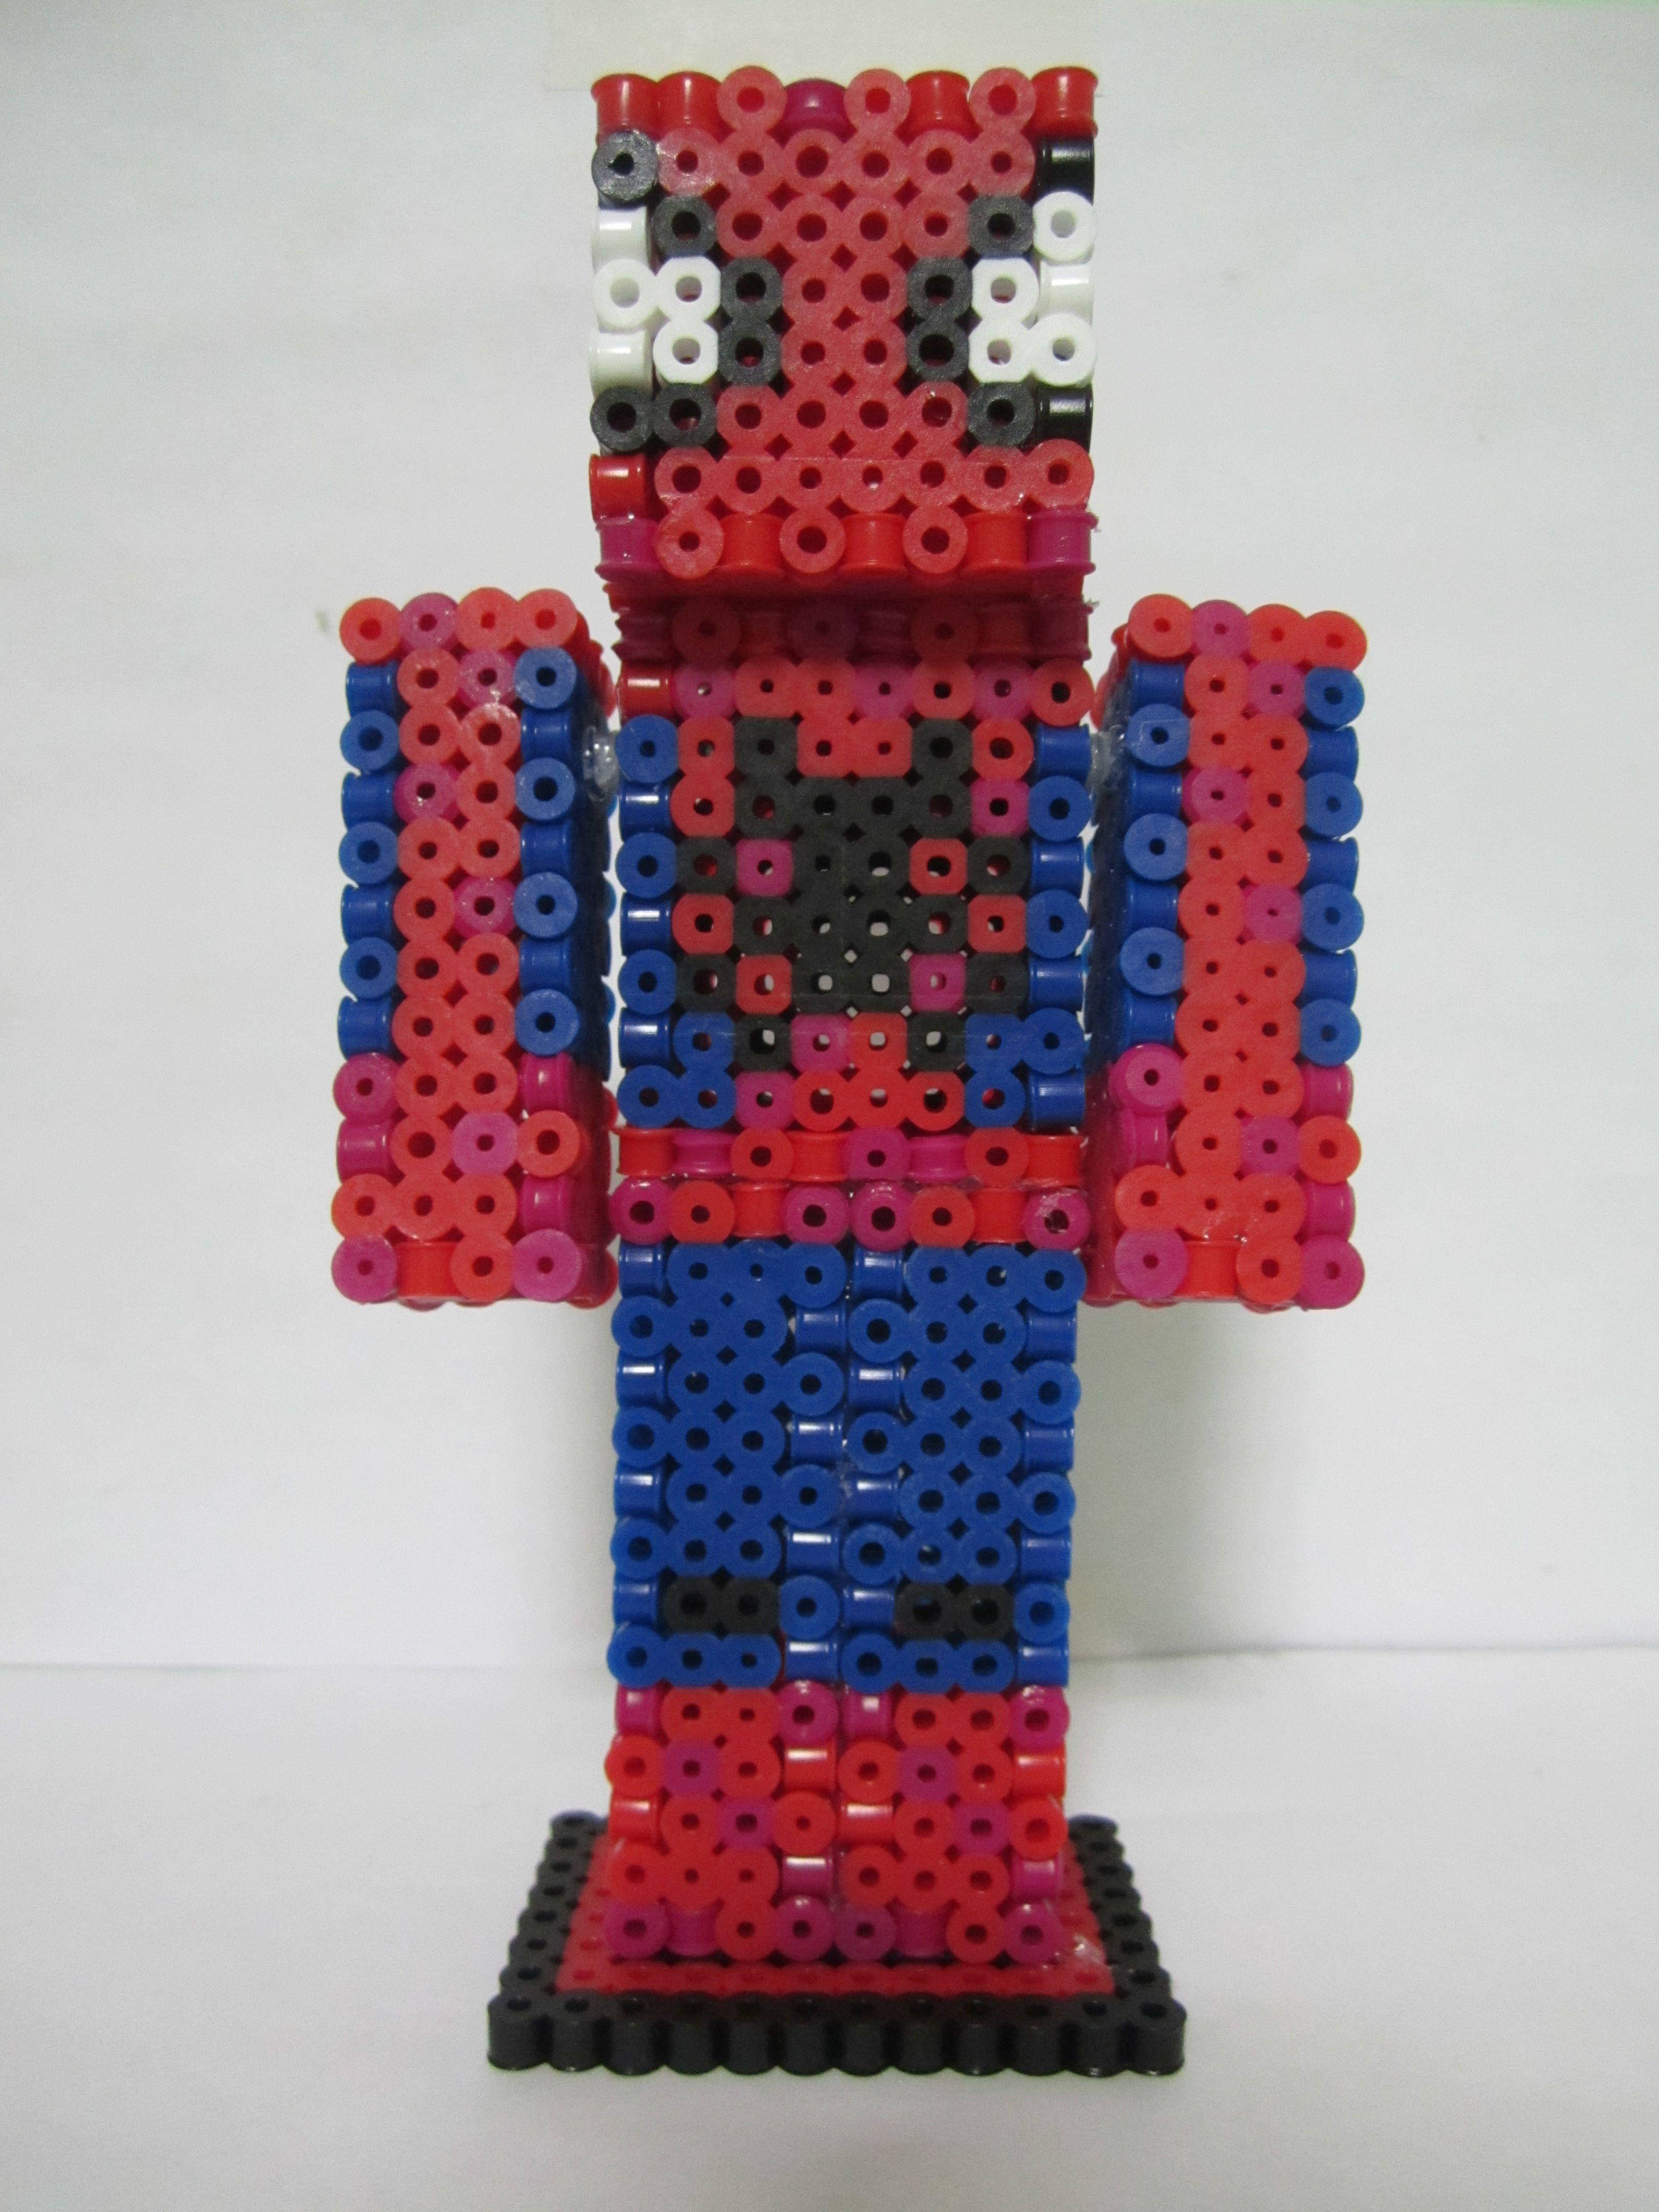 Spiderman Minecraft Skin 3dperler Beads Perler Beads Perler